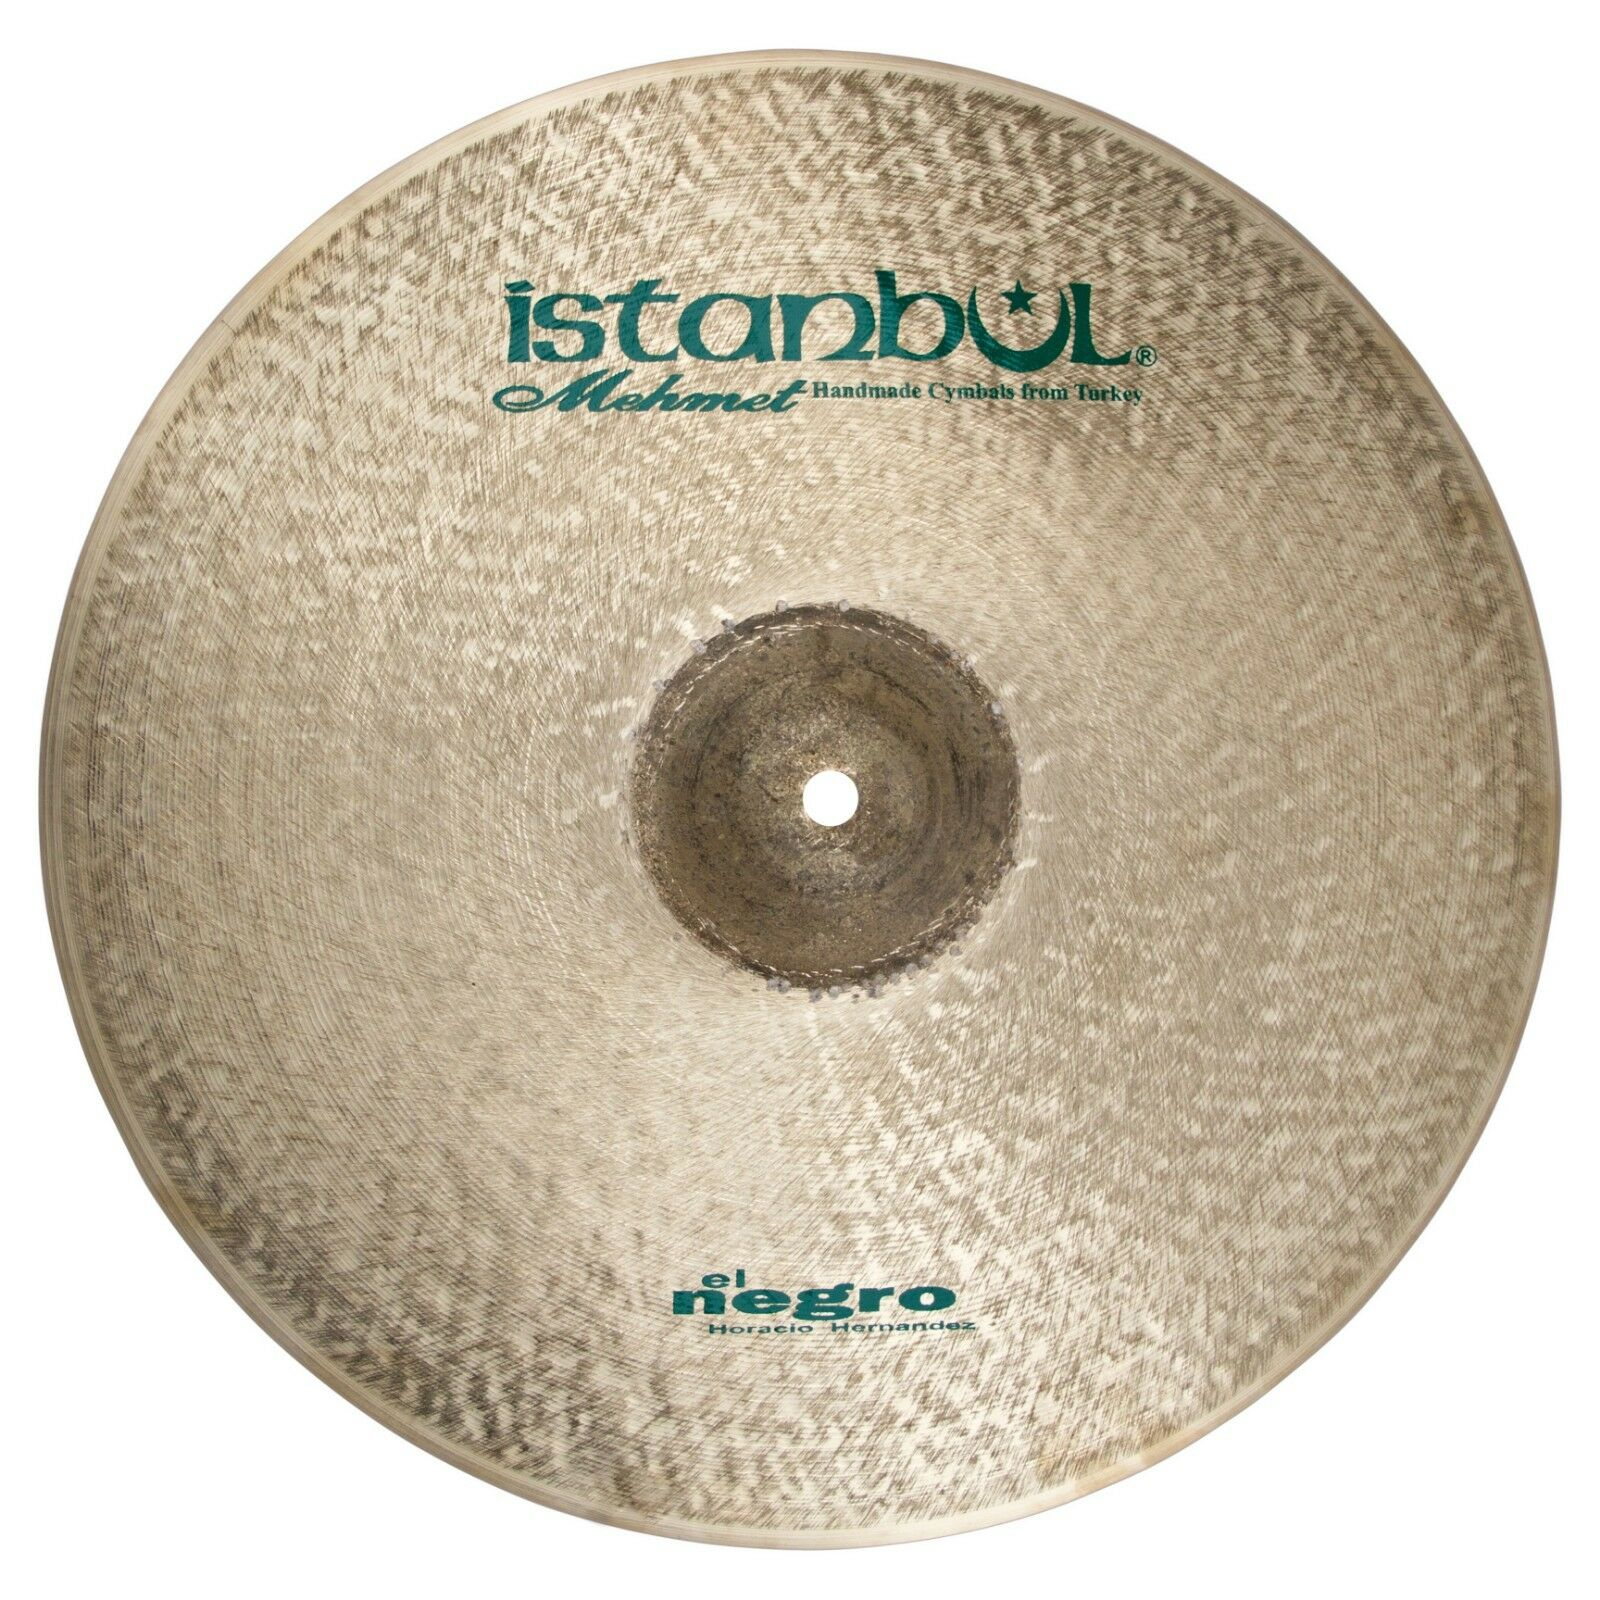 Istanbul Mehmet Cymbals · Horacio 'El schwarz' 15  Crash Cymbal (824g) DEMO VIDEO